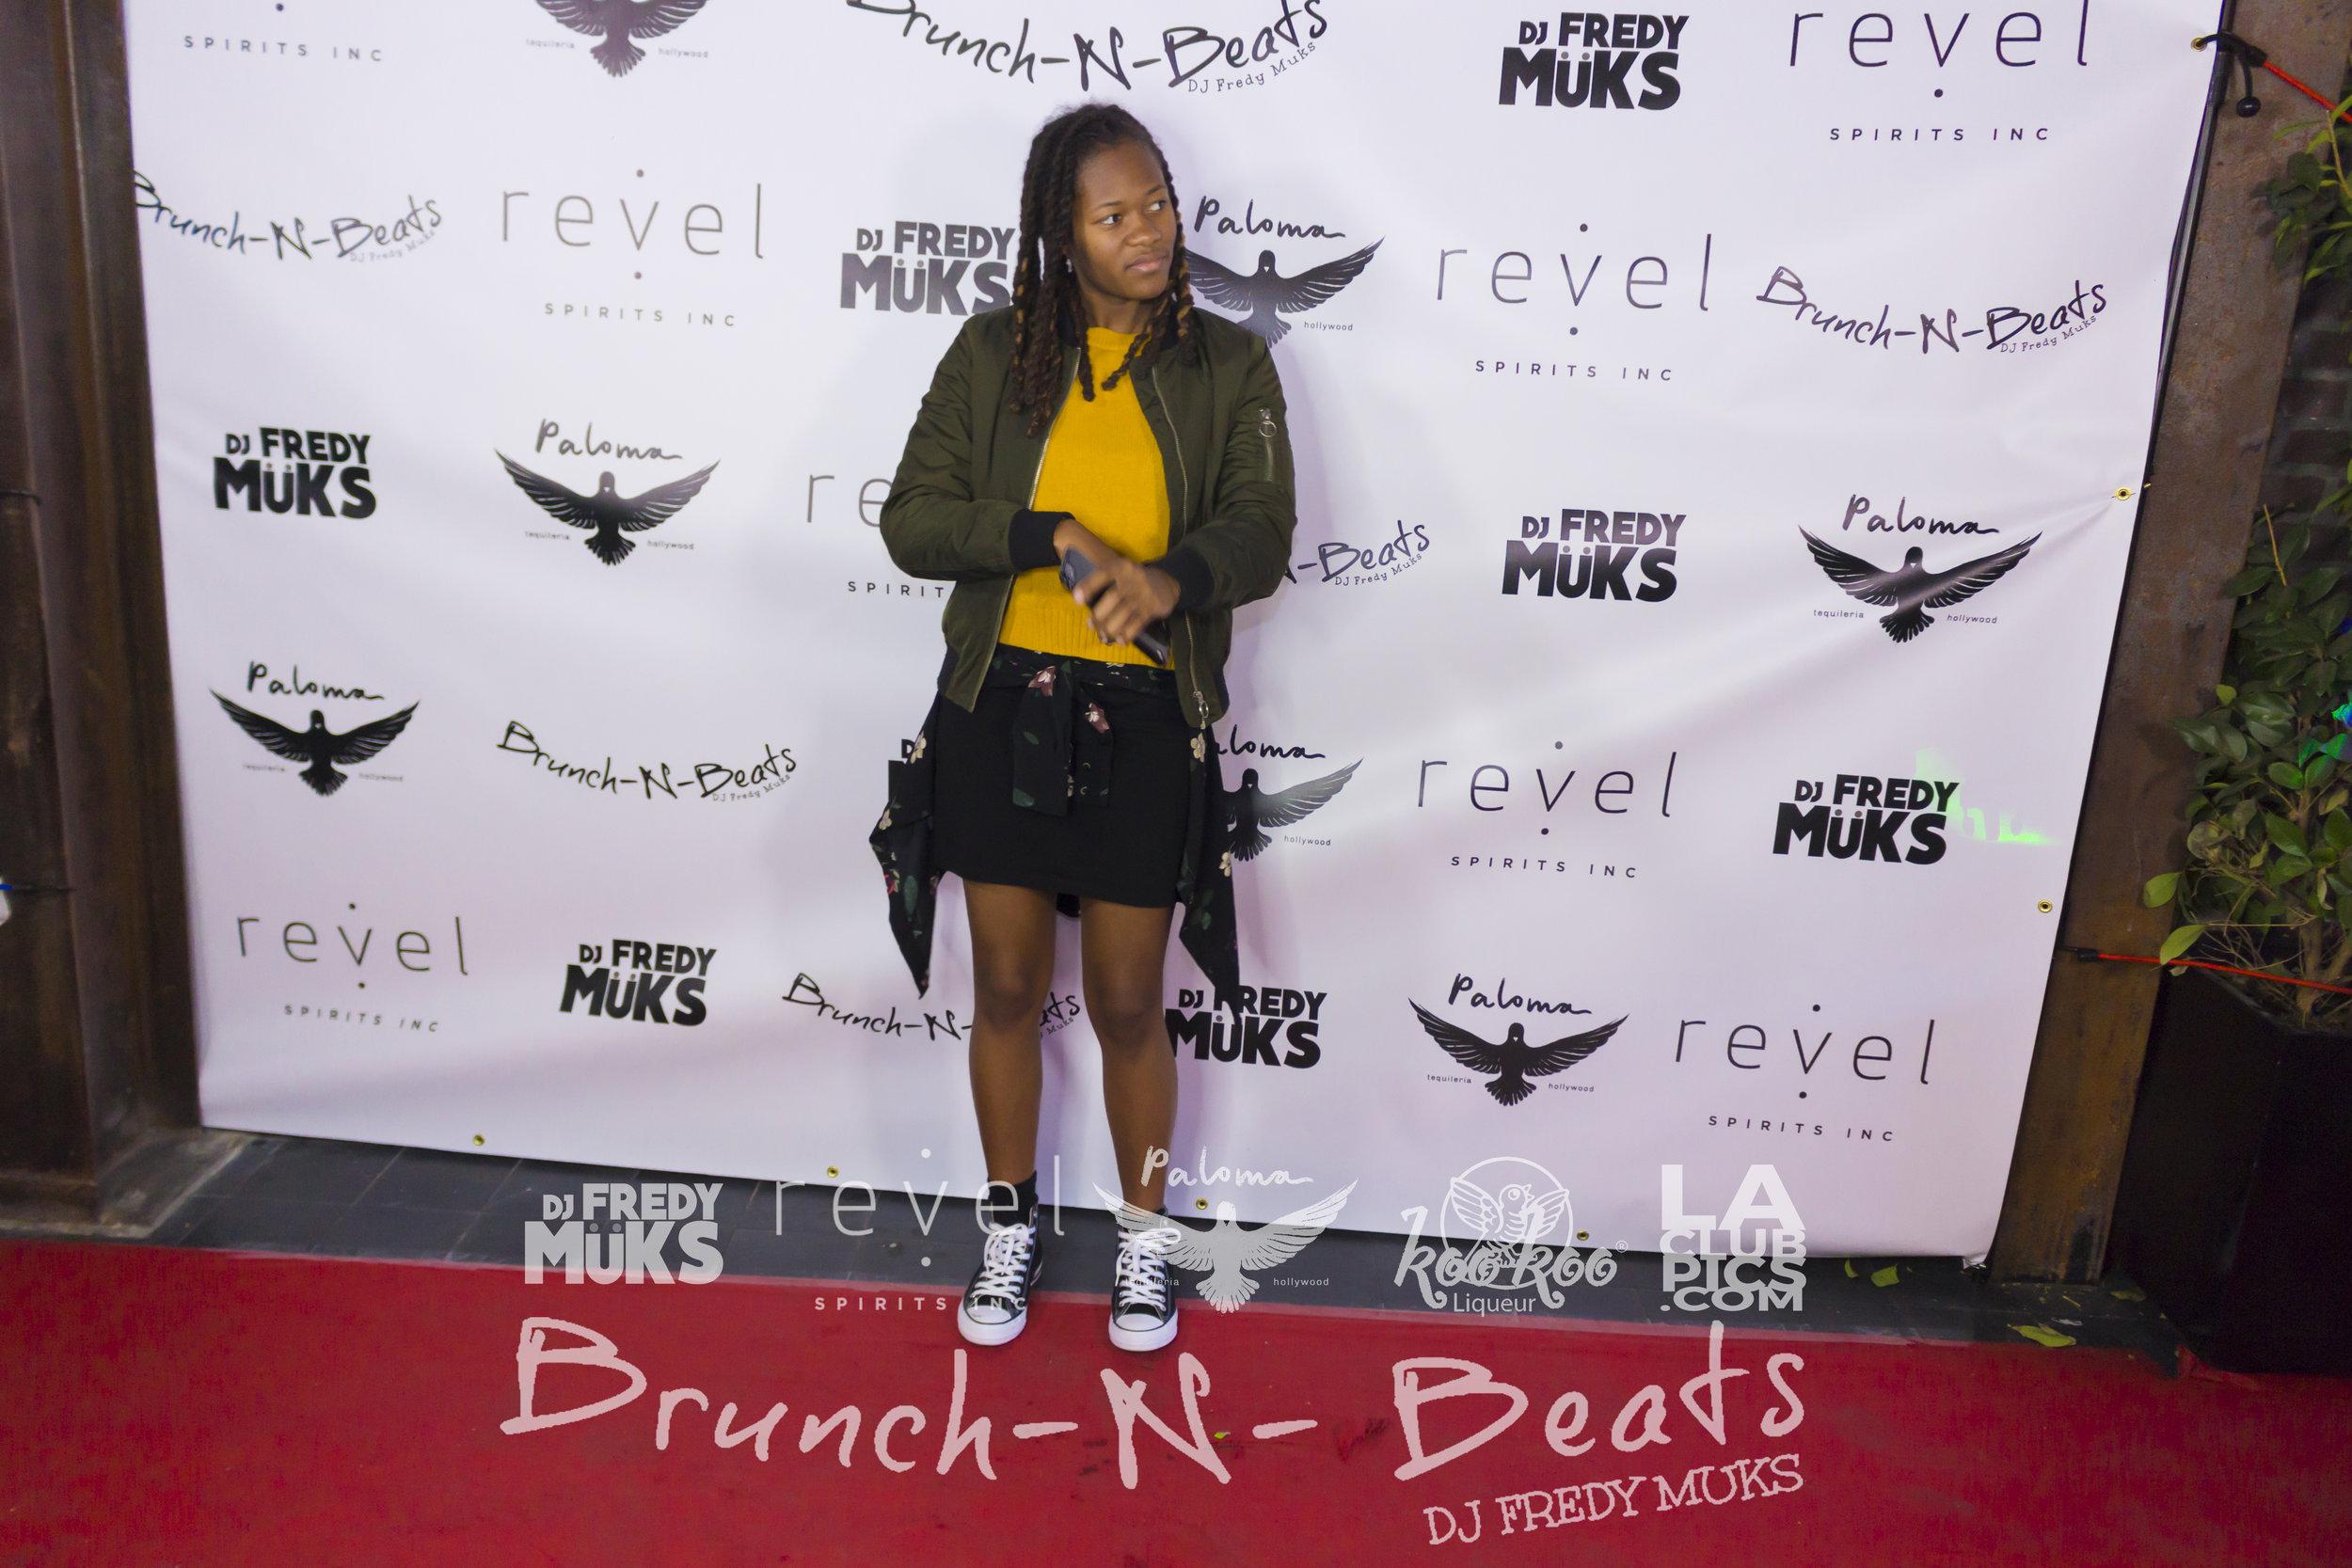 Brunch-N-Beats - Paloma Hollywood - 02-25-18_121.jpg